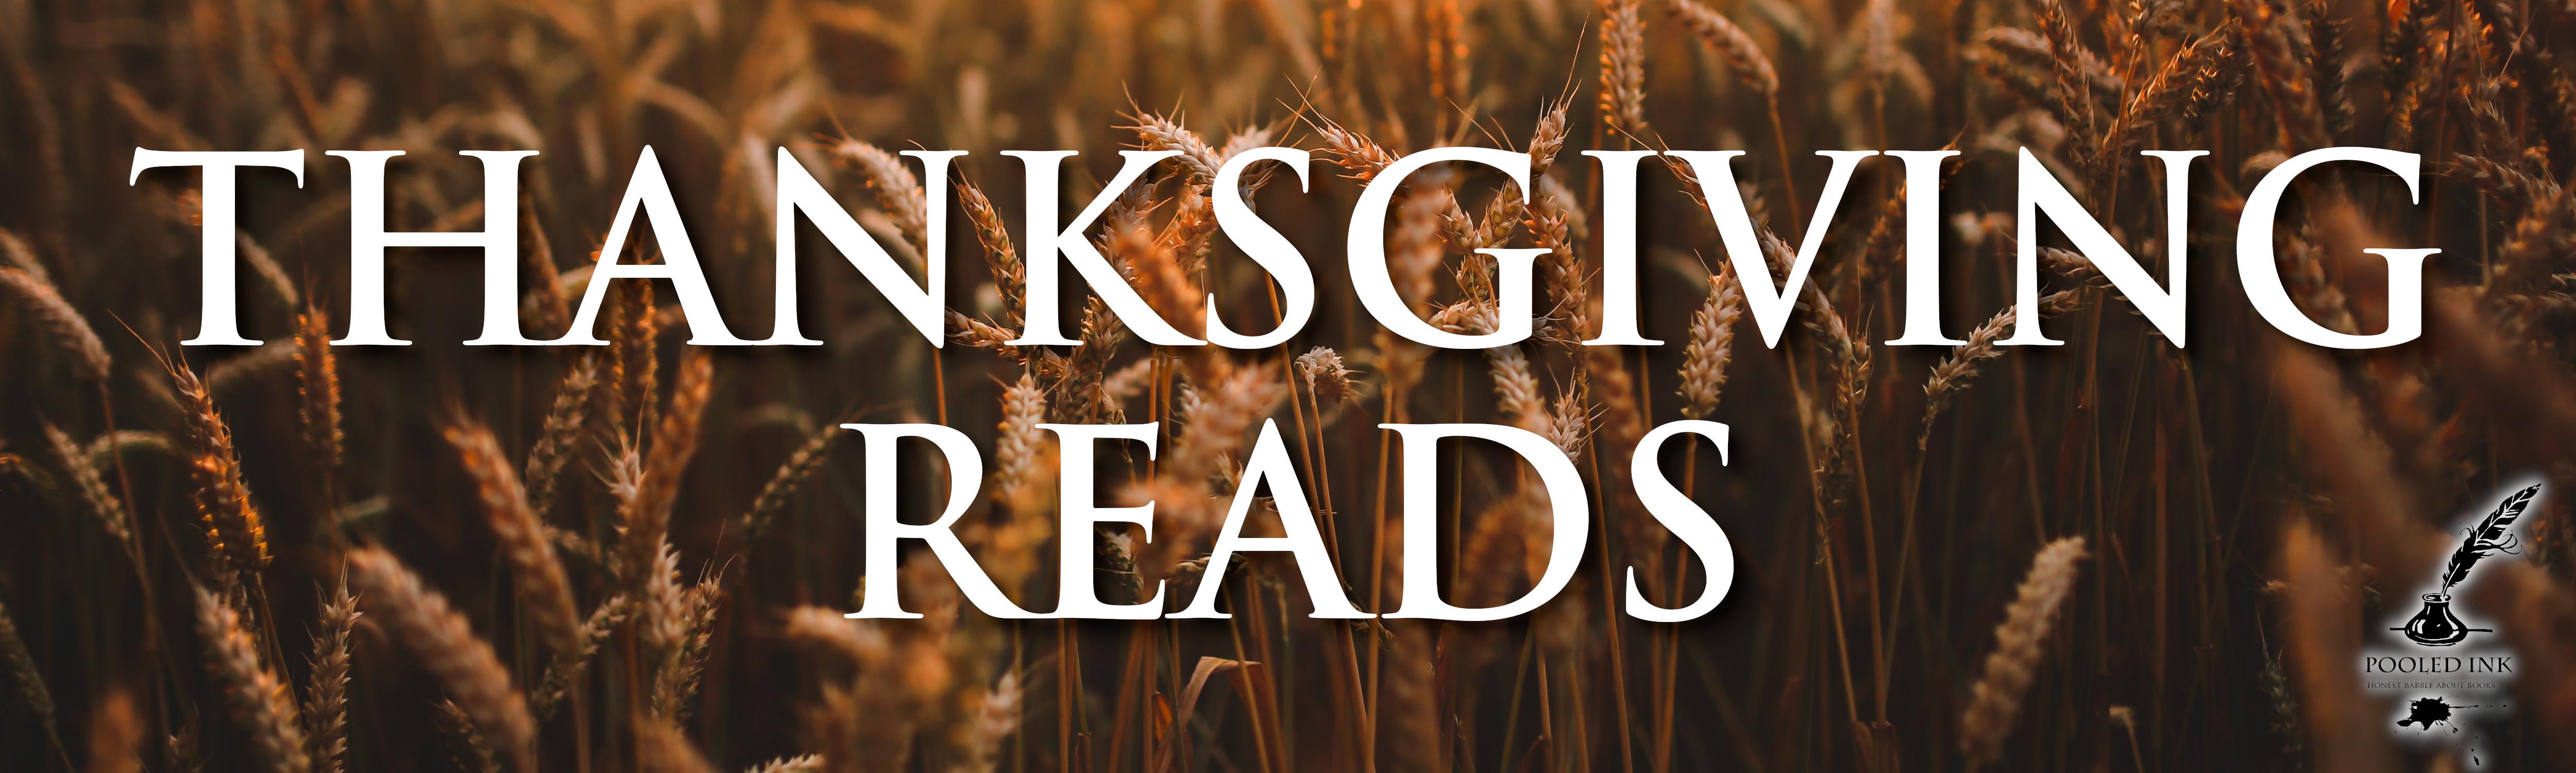 thanksgiving reads banner